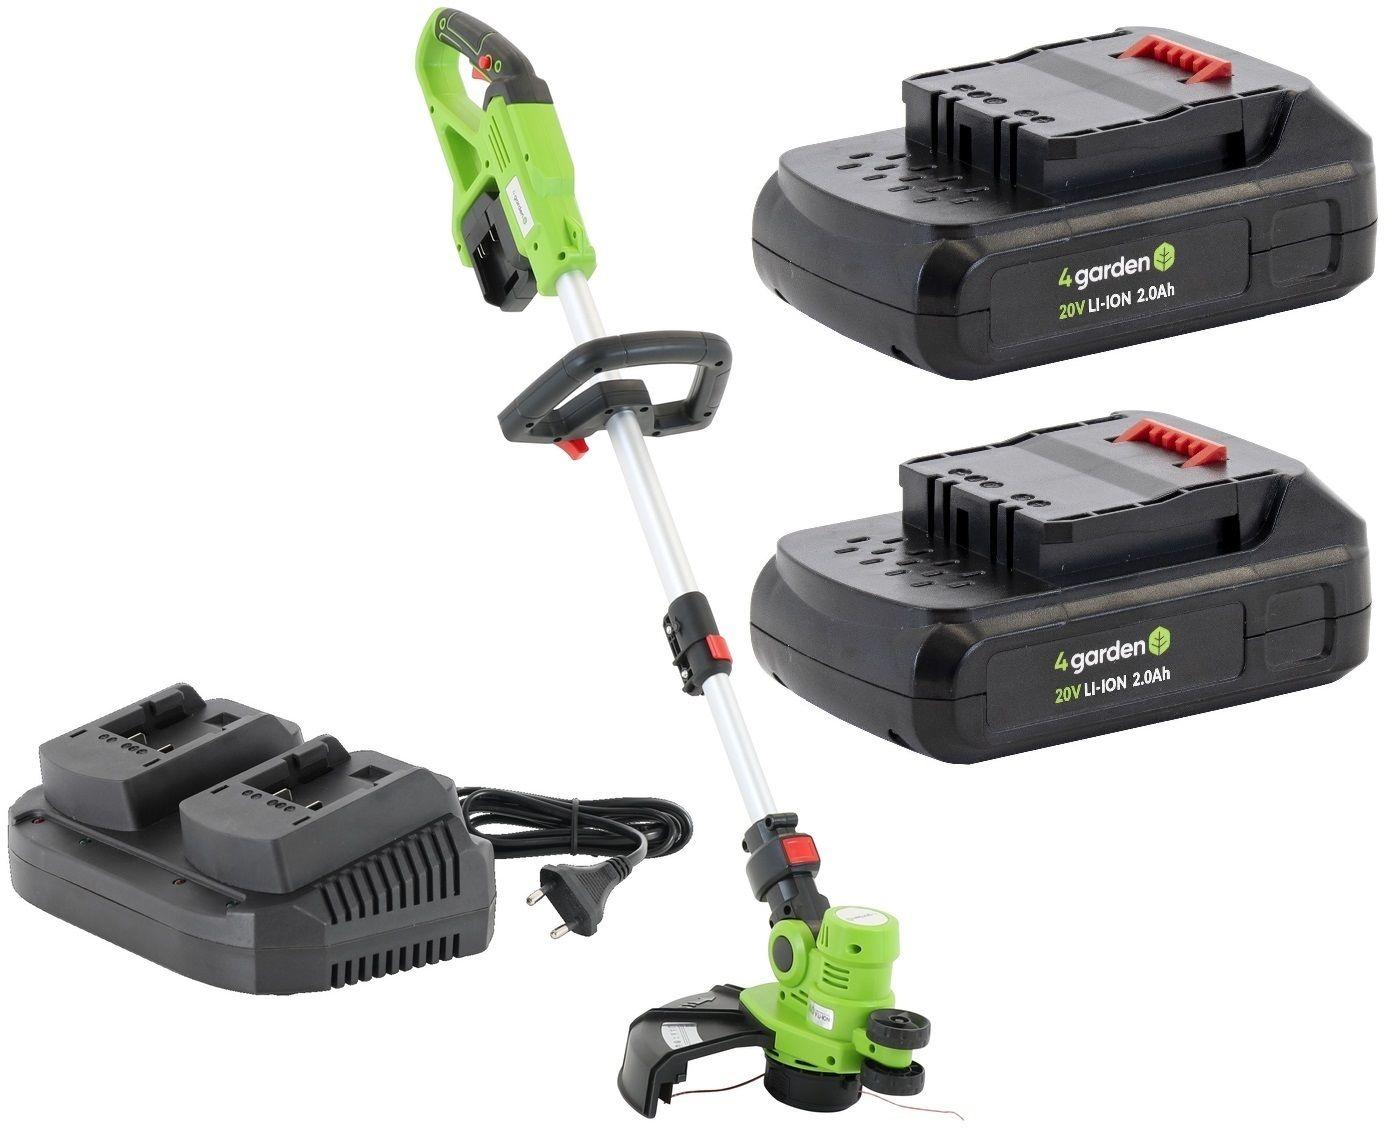 Podkaszarka APK3022 4GARDEN Akumulatorowa + 2x Akumulator 2,0 Ah + Ładowarka podwójna